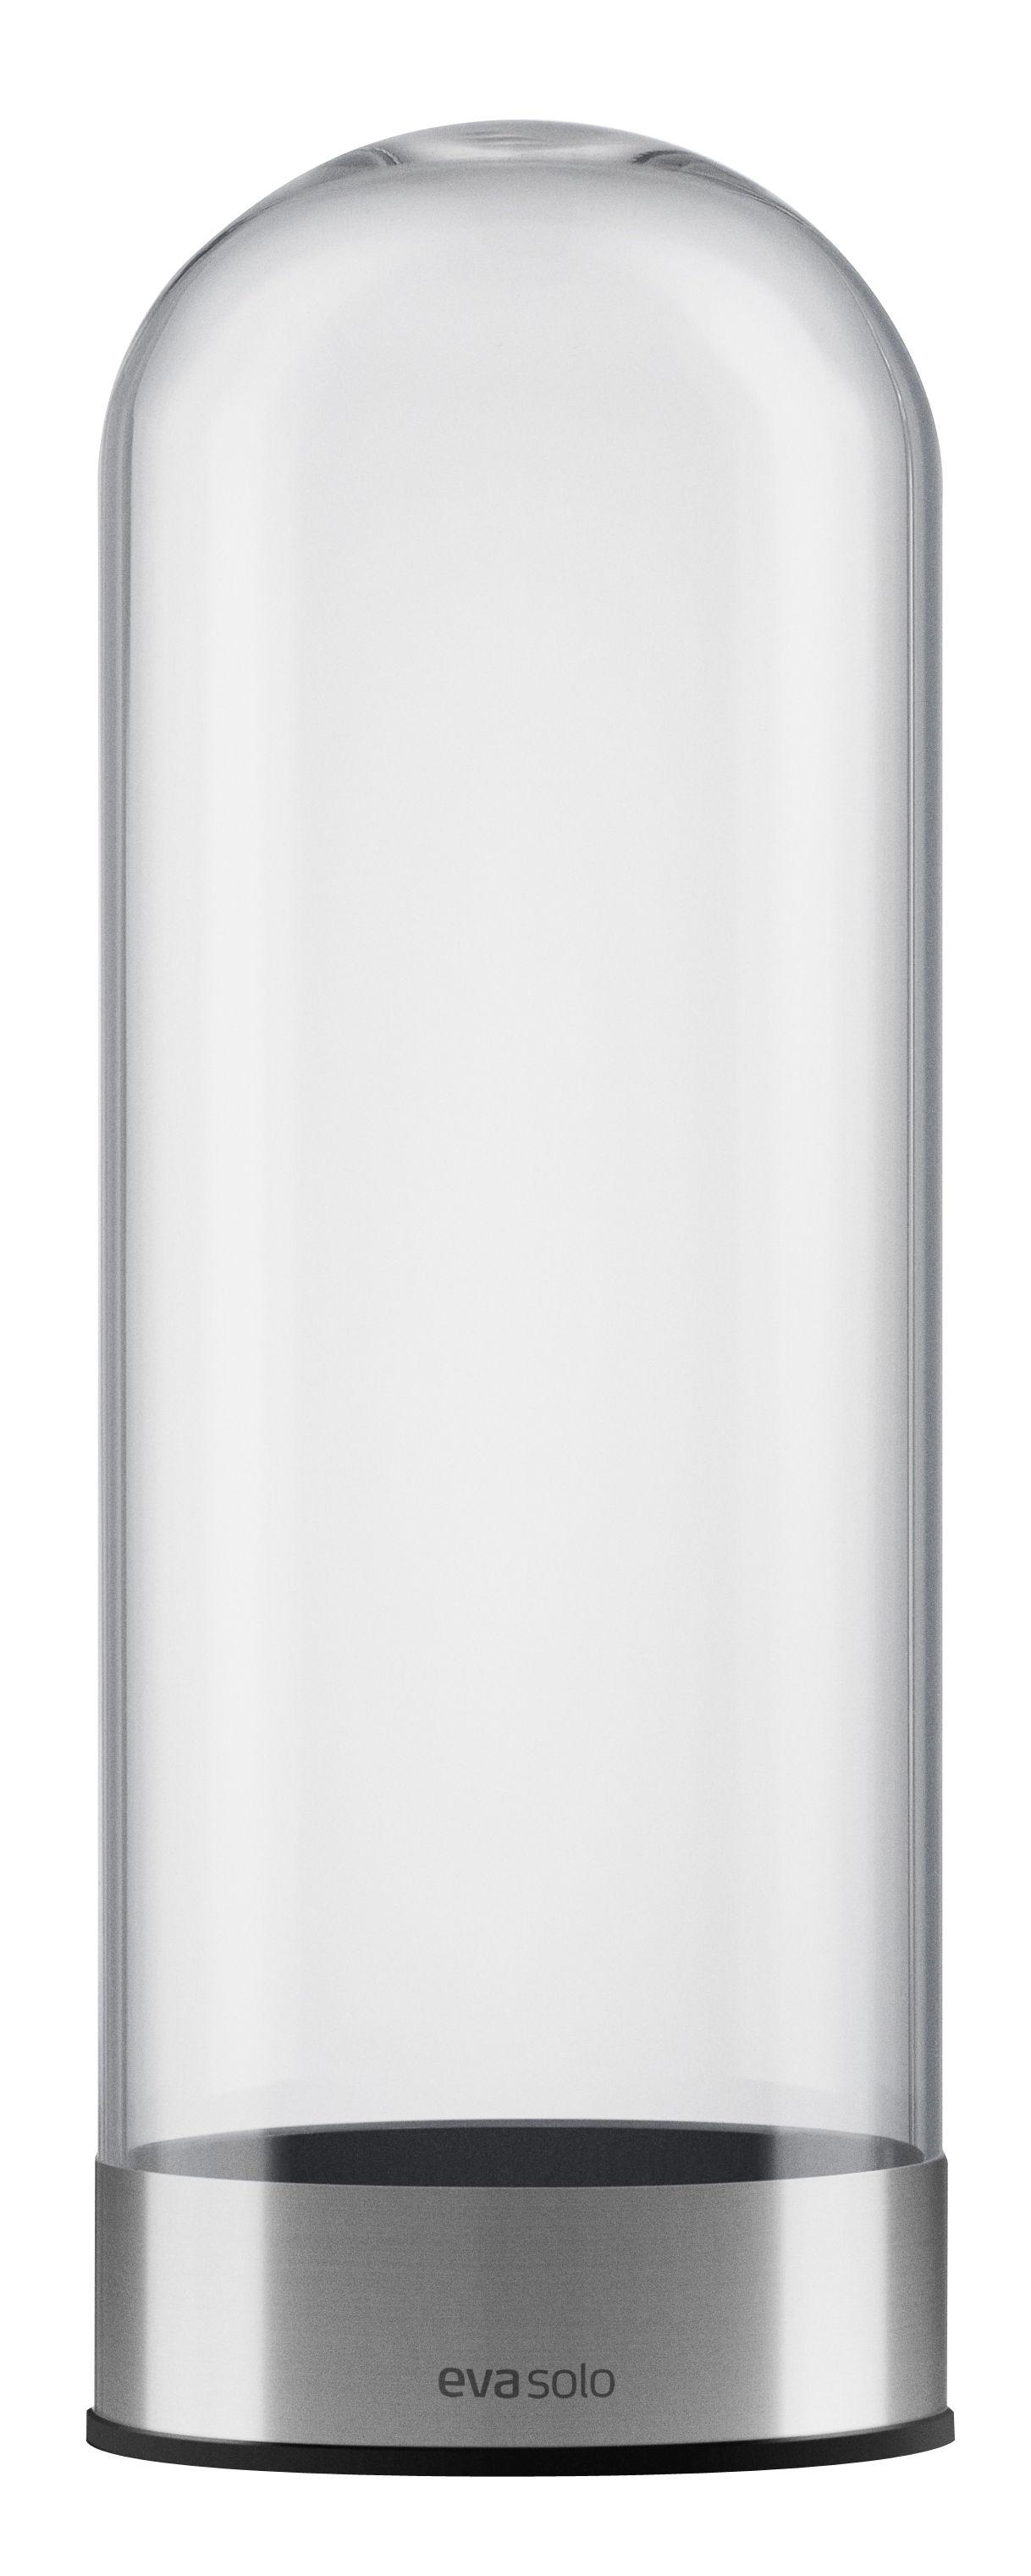 distributeur de capsules de caf transparent chrom eva solo. Black Bedroom Furniture Sets. Home Design Ideas